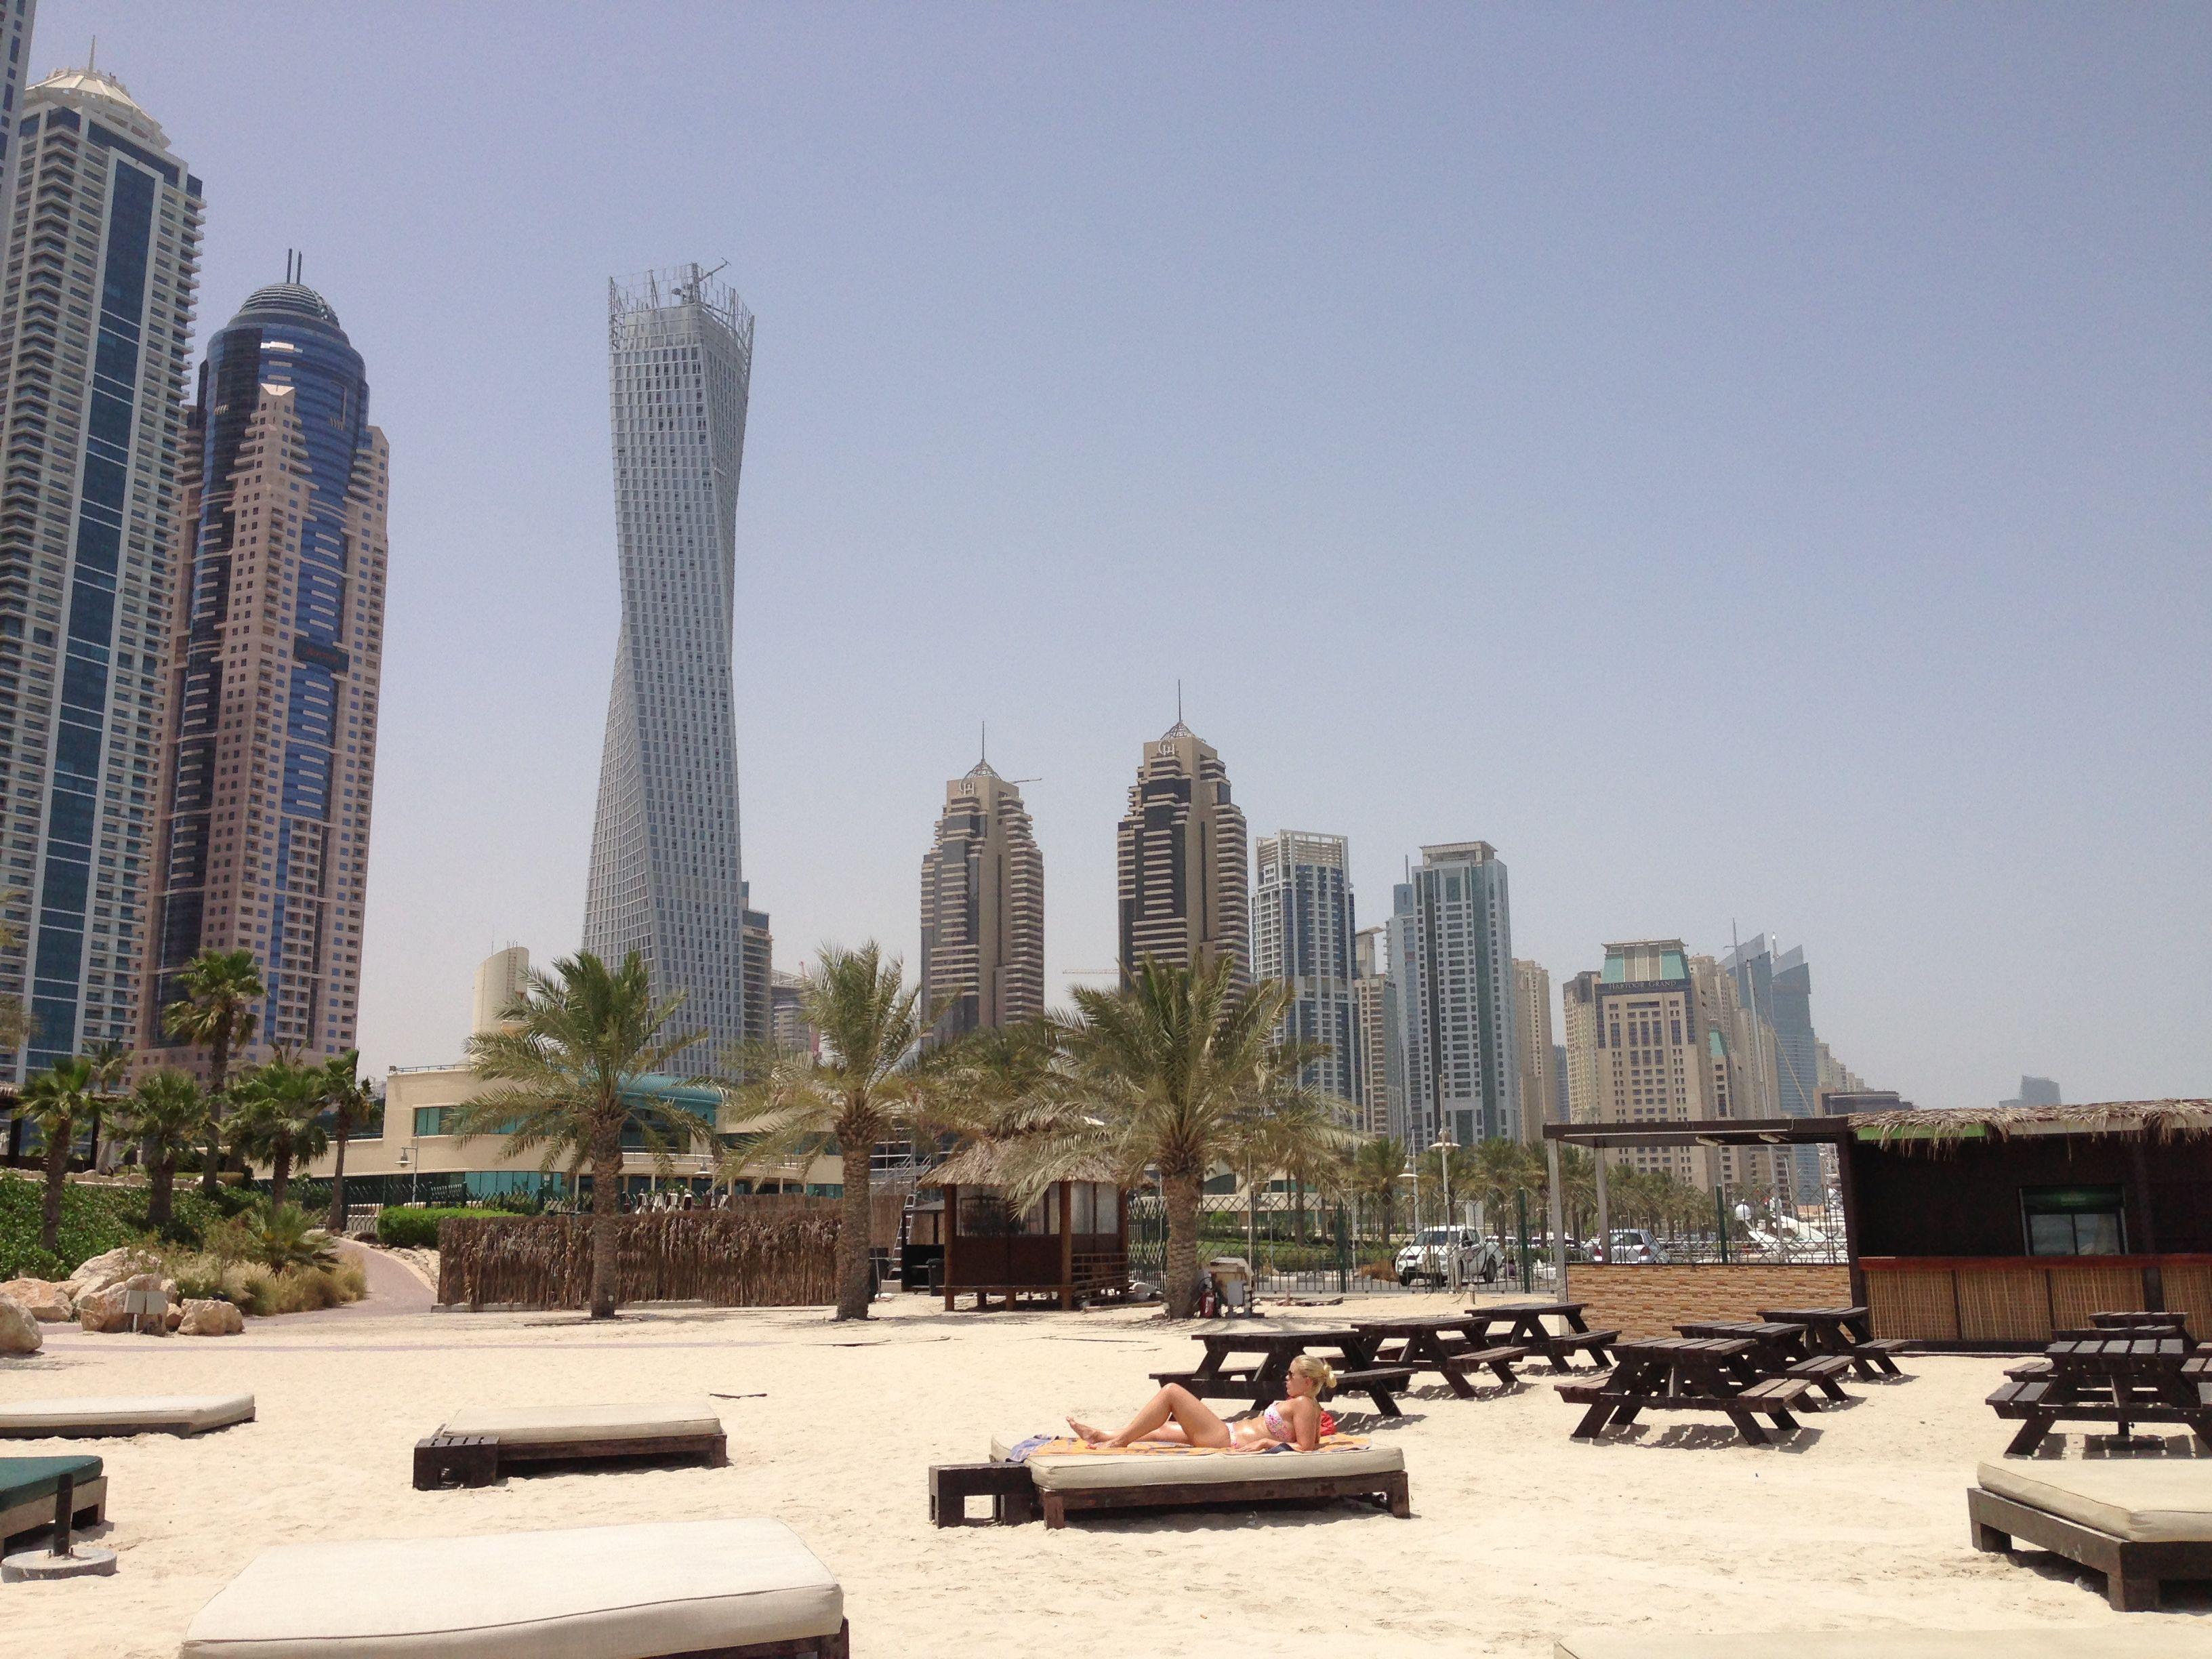 3 Mädels, 1001 Nacht: Dubai